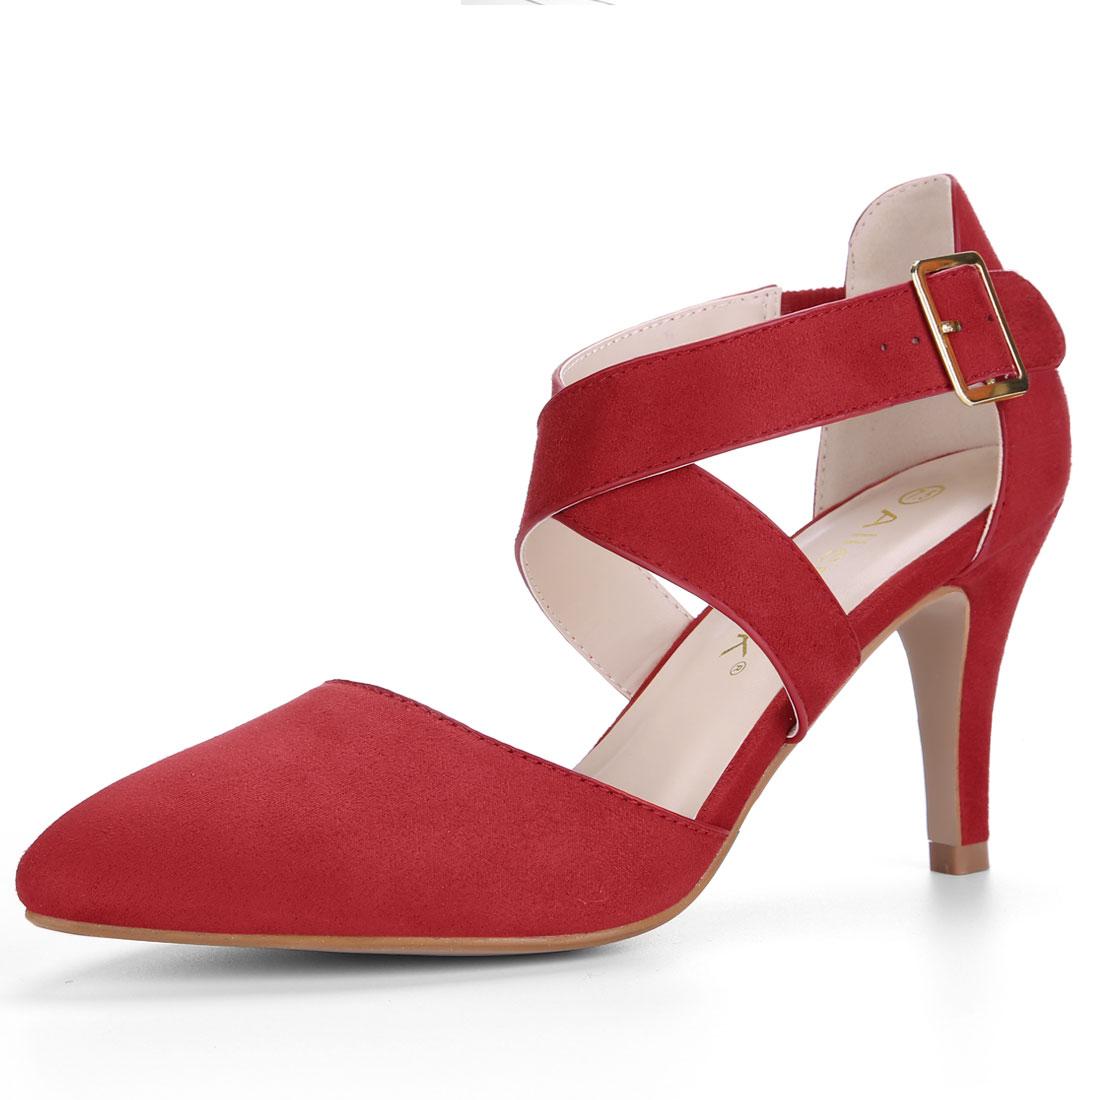 Allegra K Women's Crisscross Straps Stiletto Heel Ankle Strap Pumps Red US 9